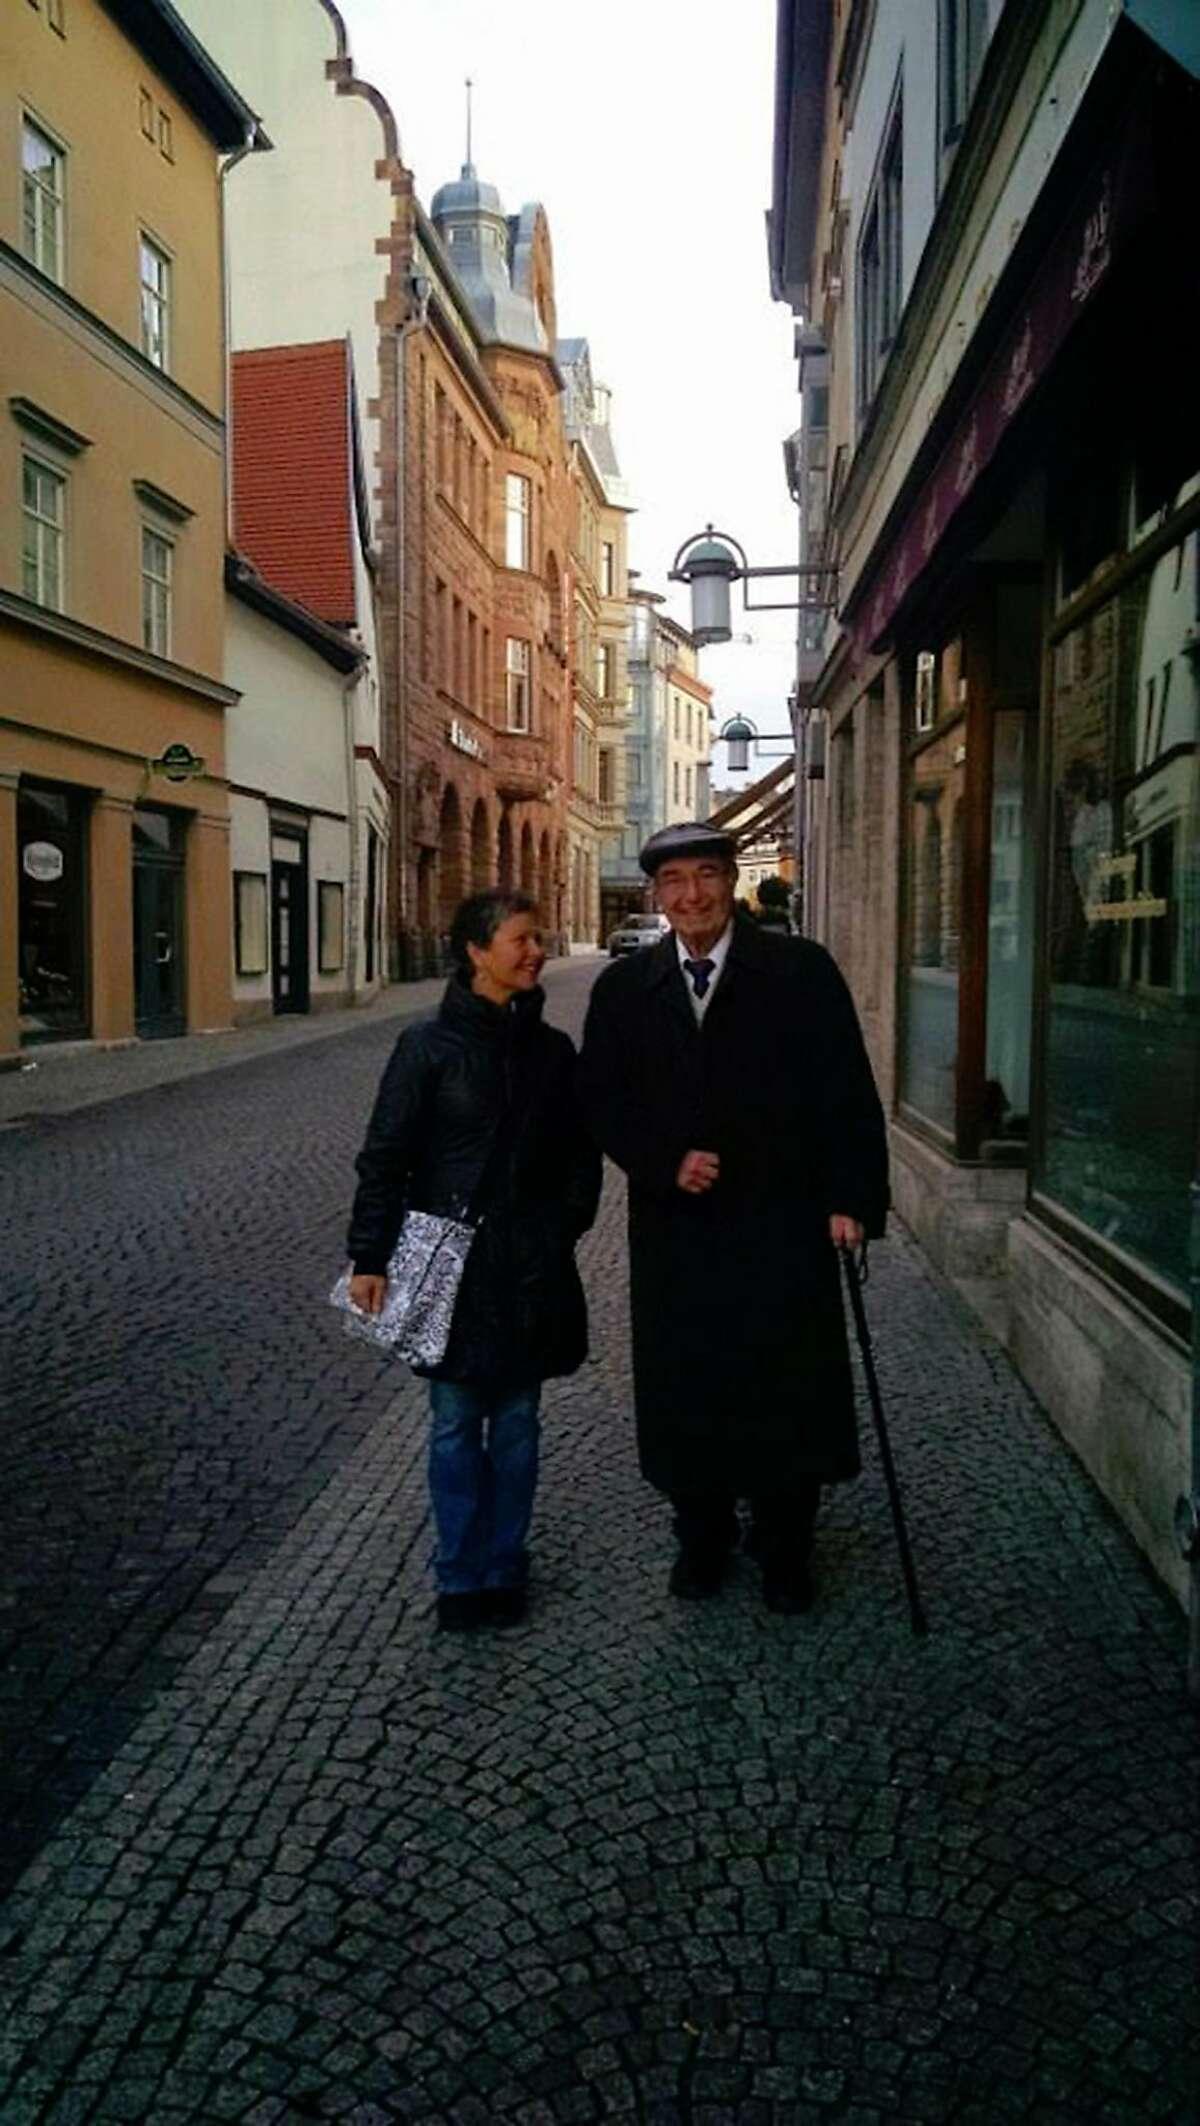 Elizabeth Rosner and her father Karl Rosner, taken in April 2015 in Weimar, Germany by Elizabeth's nephew Ezra Brettler.